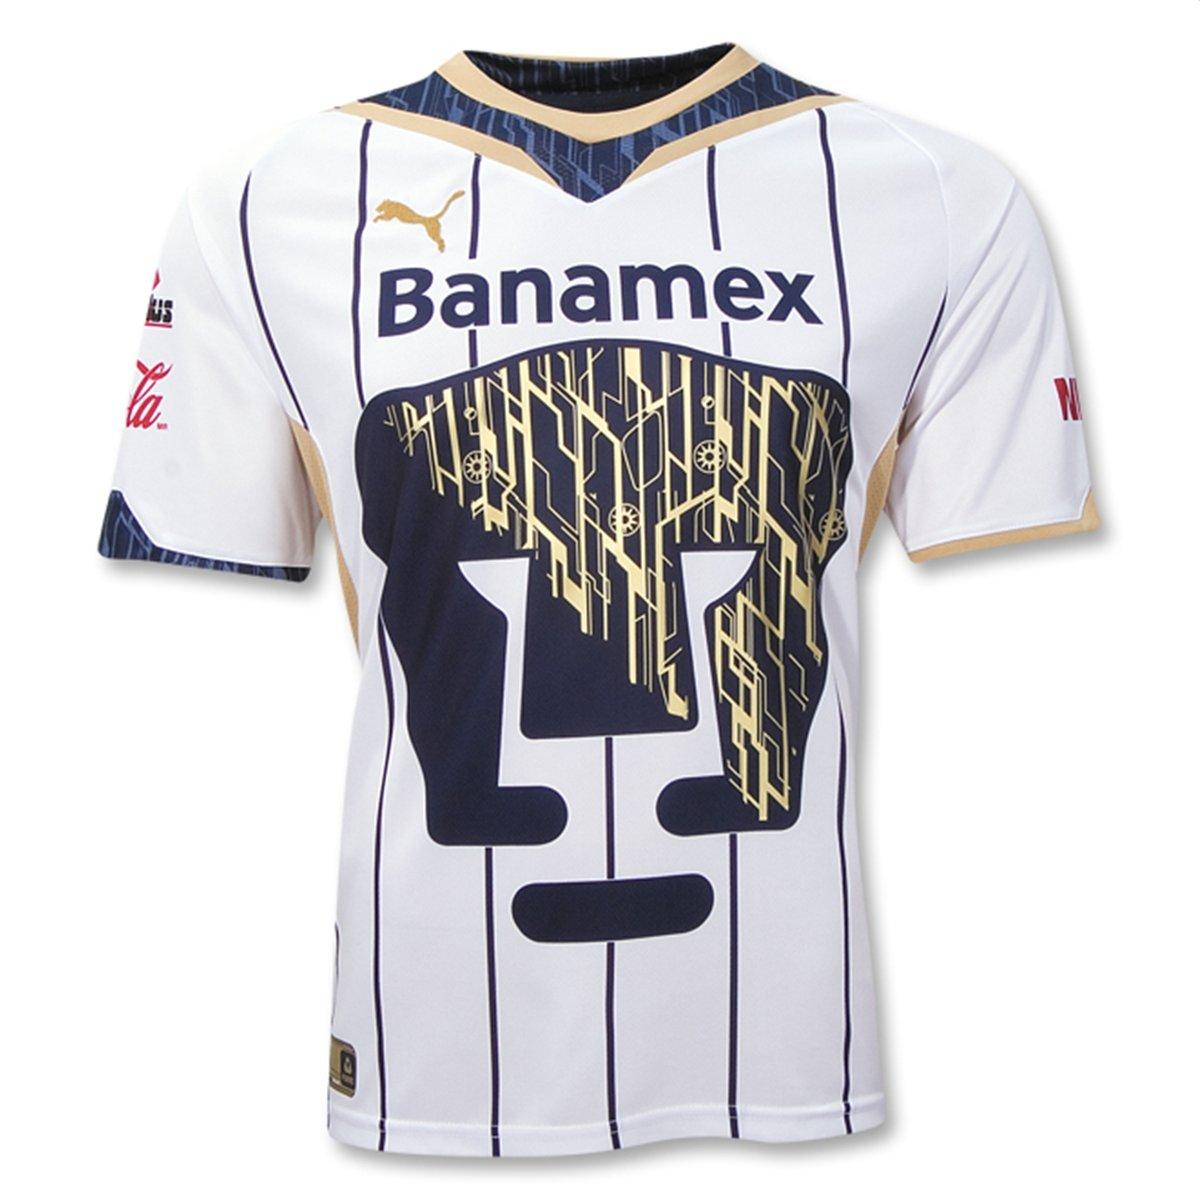 7971cbb5078 Amazon.com : Pumas 10/11 Home Soccer Jersey : Sports Fan Soccer Jerseys :  Sports & Outdoors